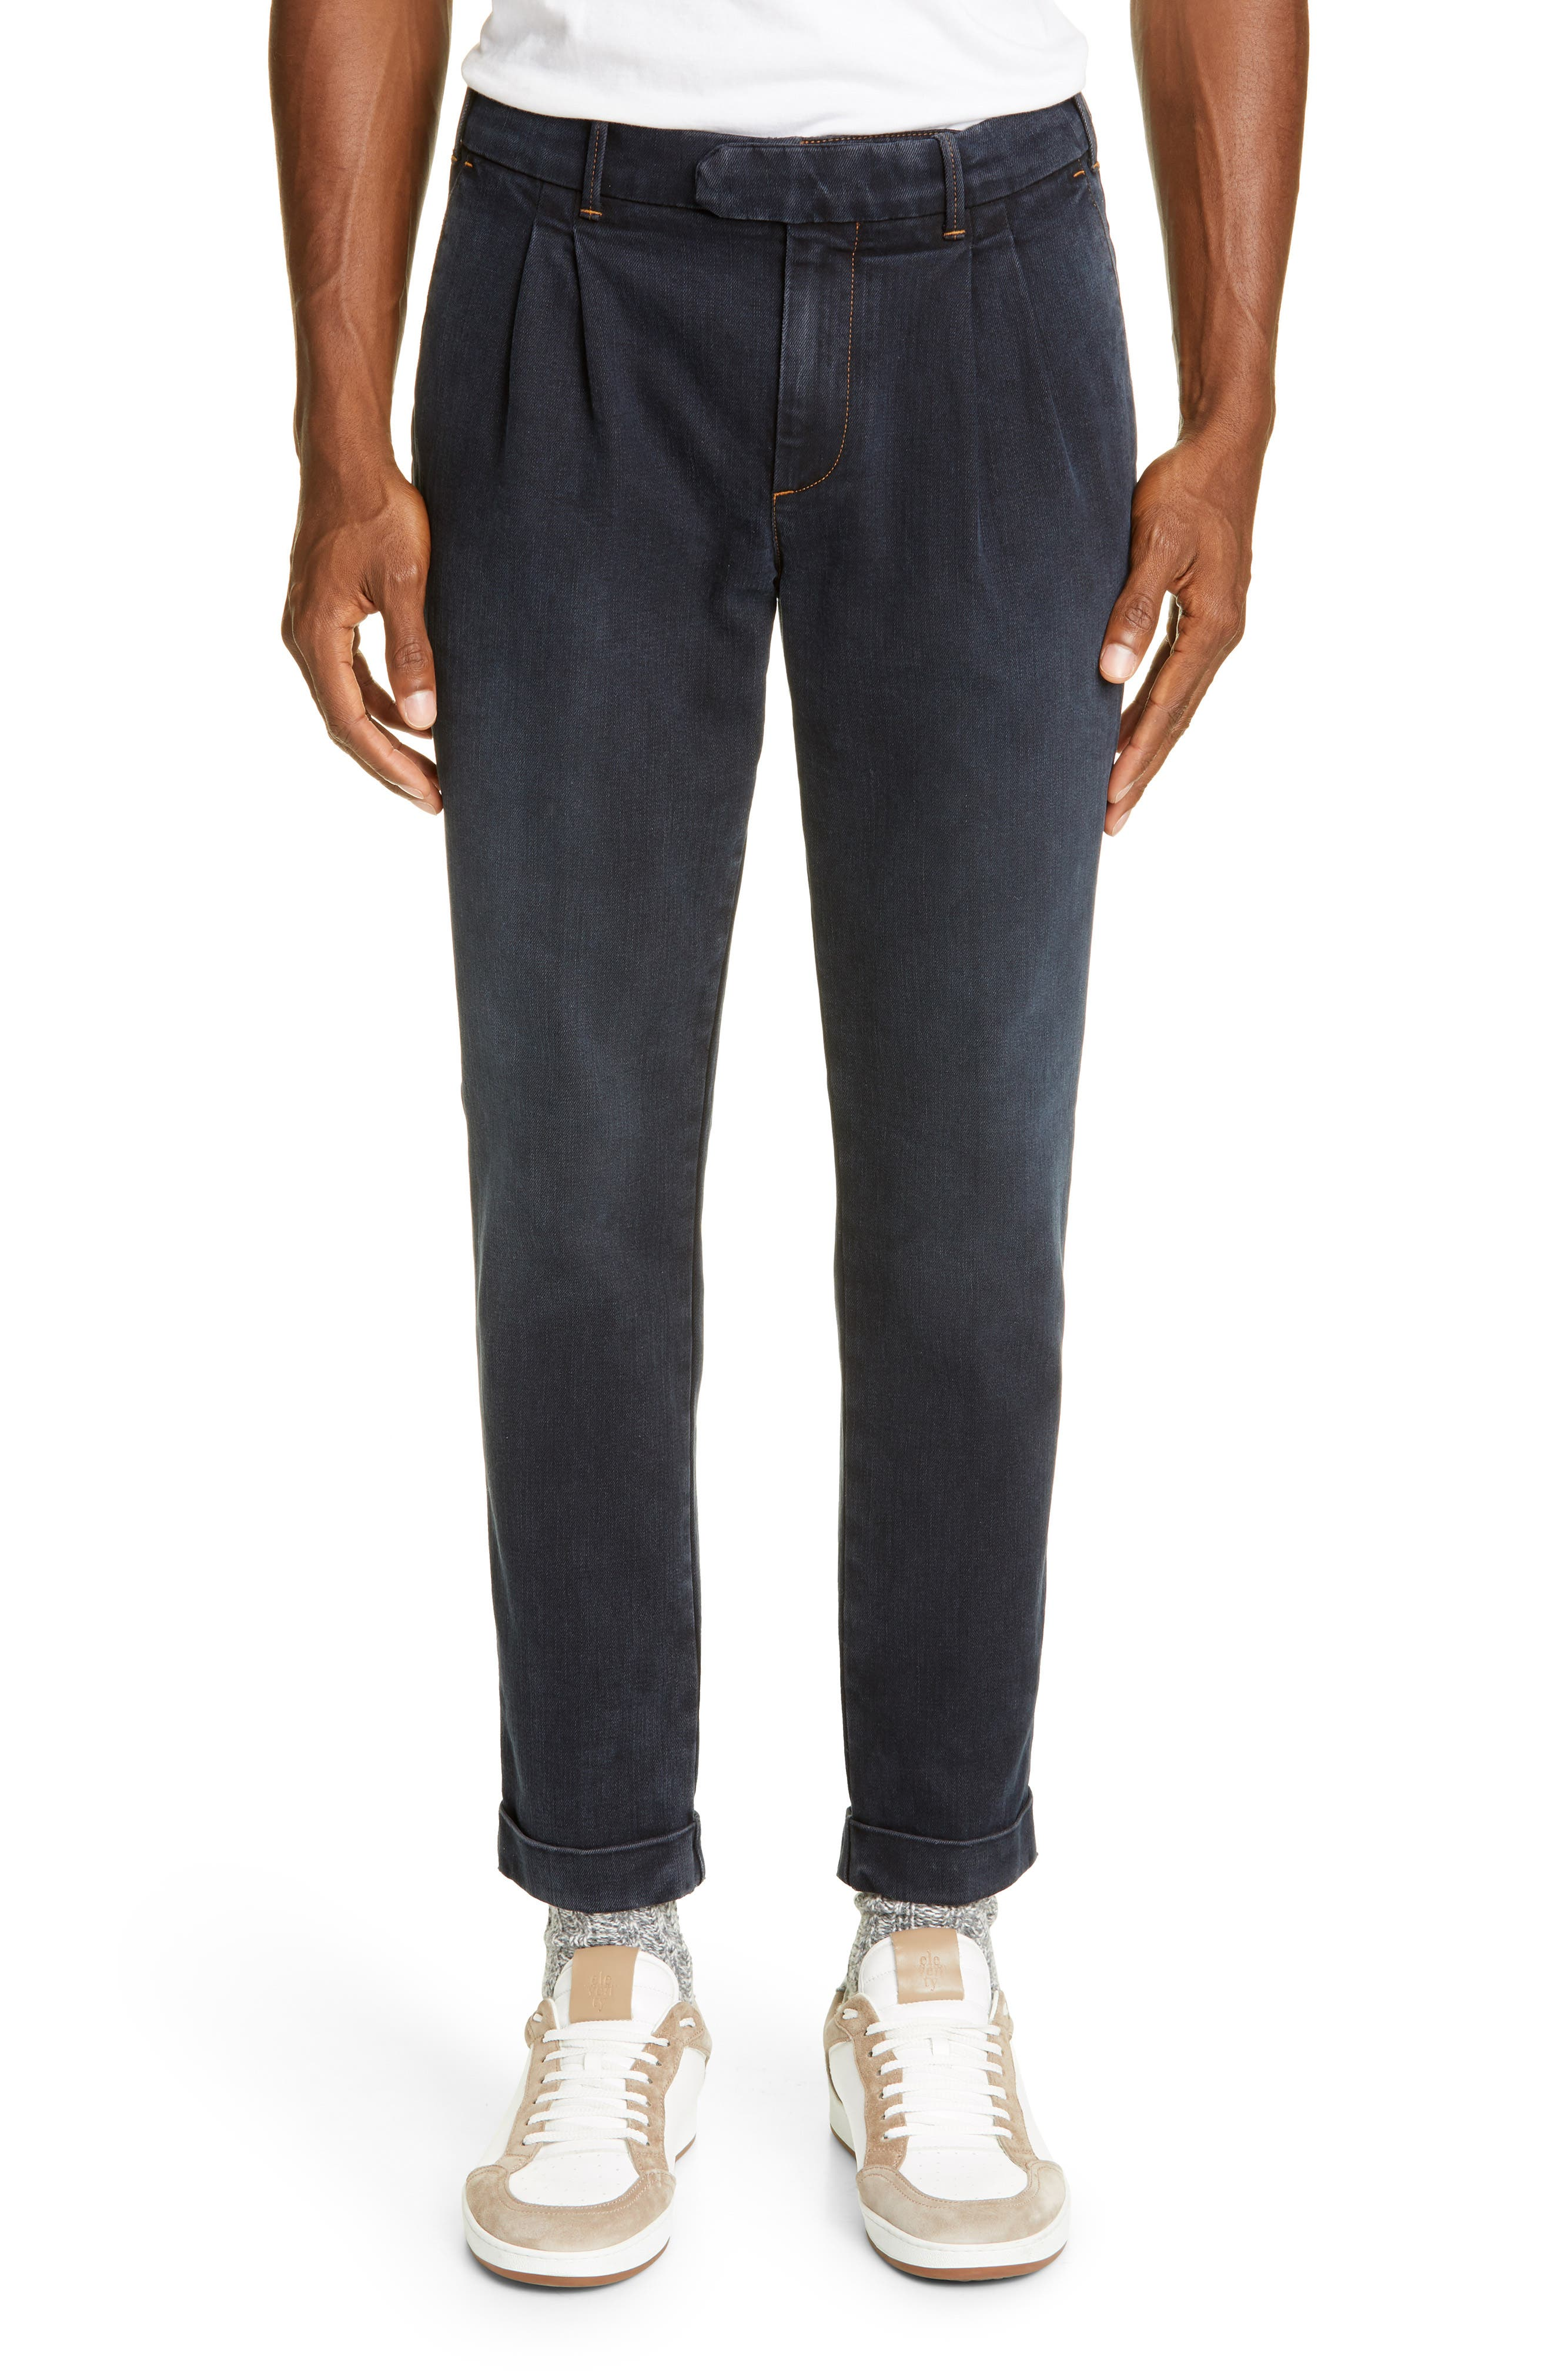 Men's Vintage Pants, Trousers, Jeans, Overalls Mens Eleventy Pleated Cotton Blend Jeans $395.00 AT vintagedancer.com